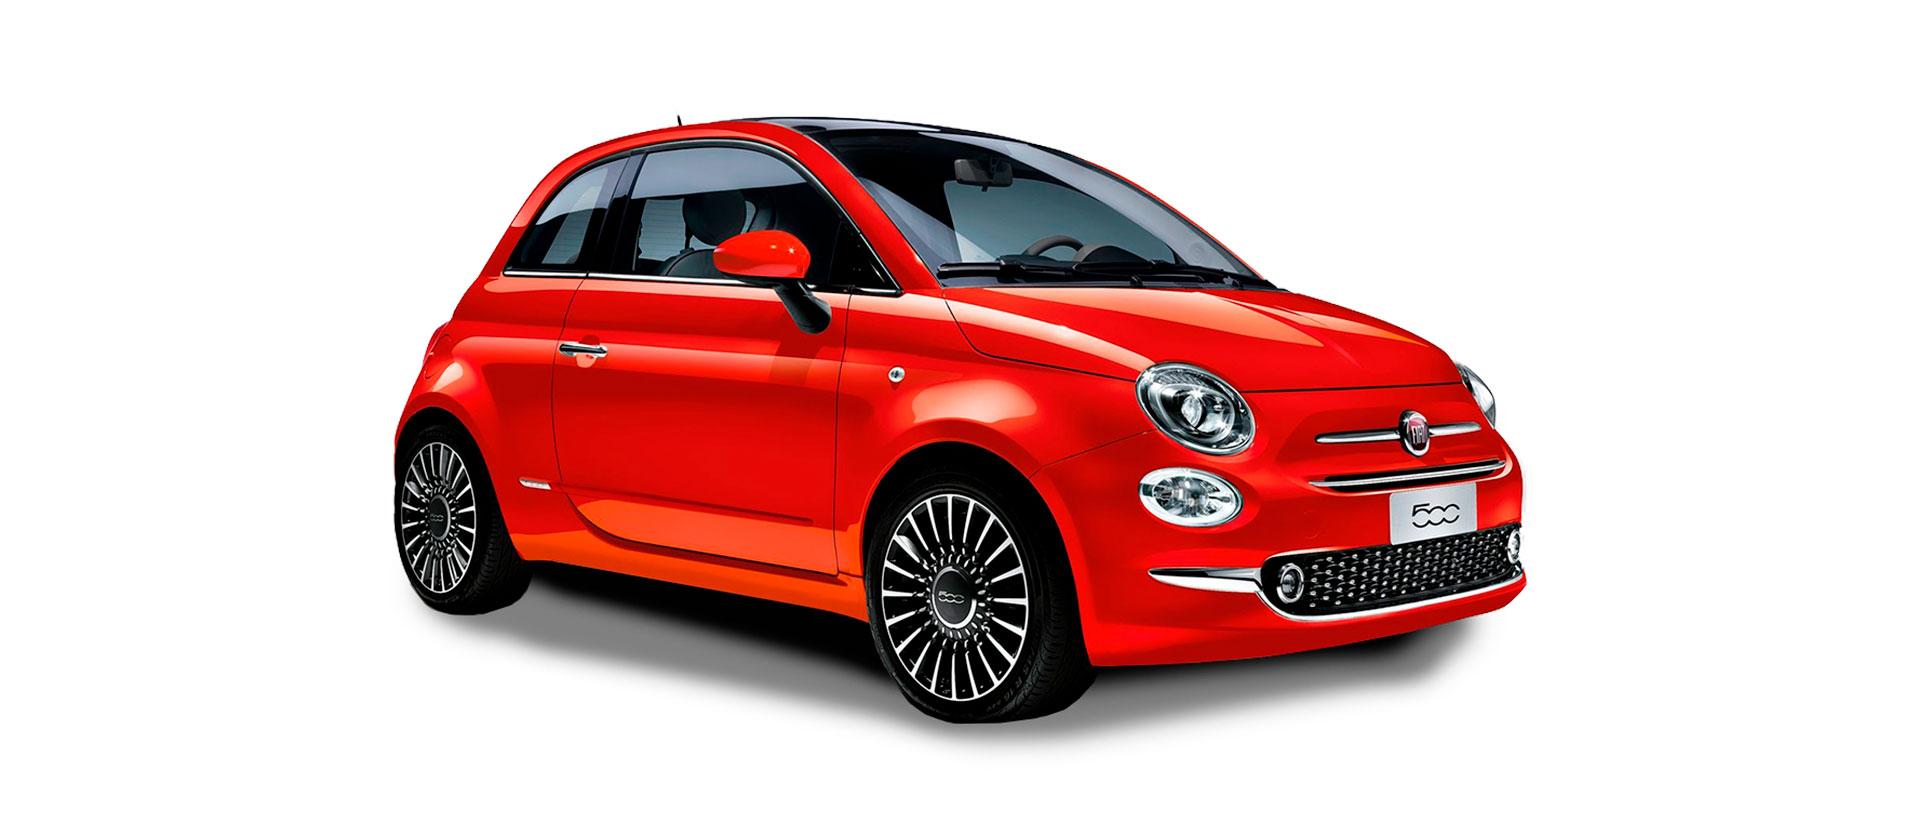 alquila un Fiat 500